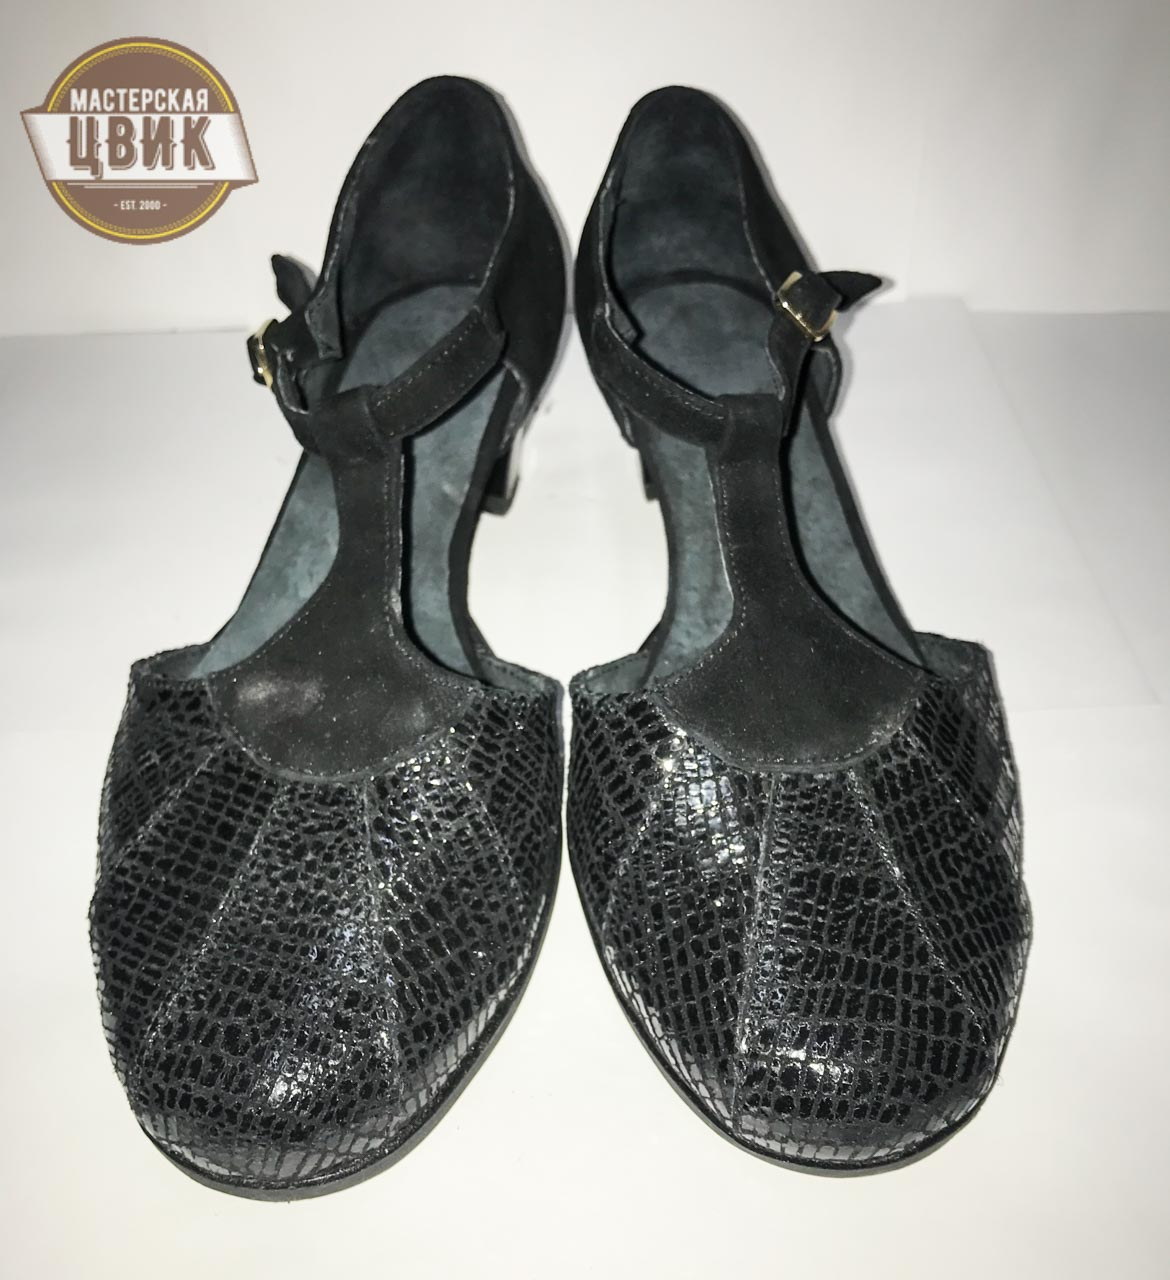 individualnyj-poshiv-obuvi-minsk-15 Индивидуальный пошив обуви